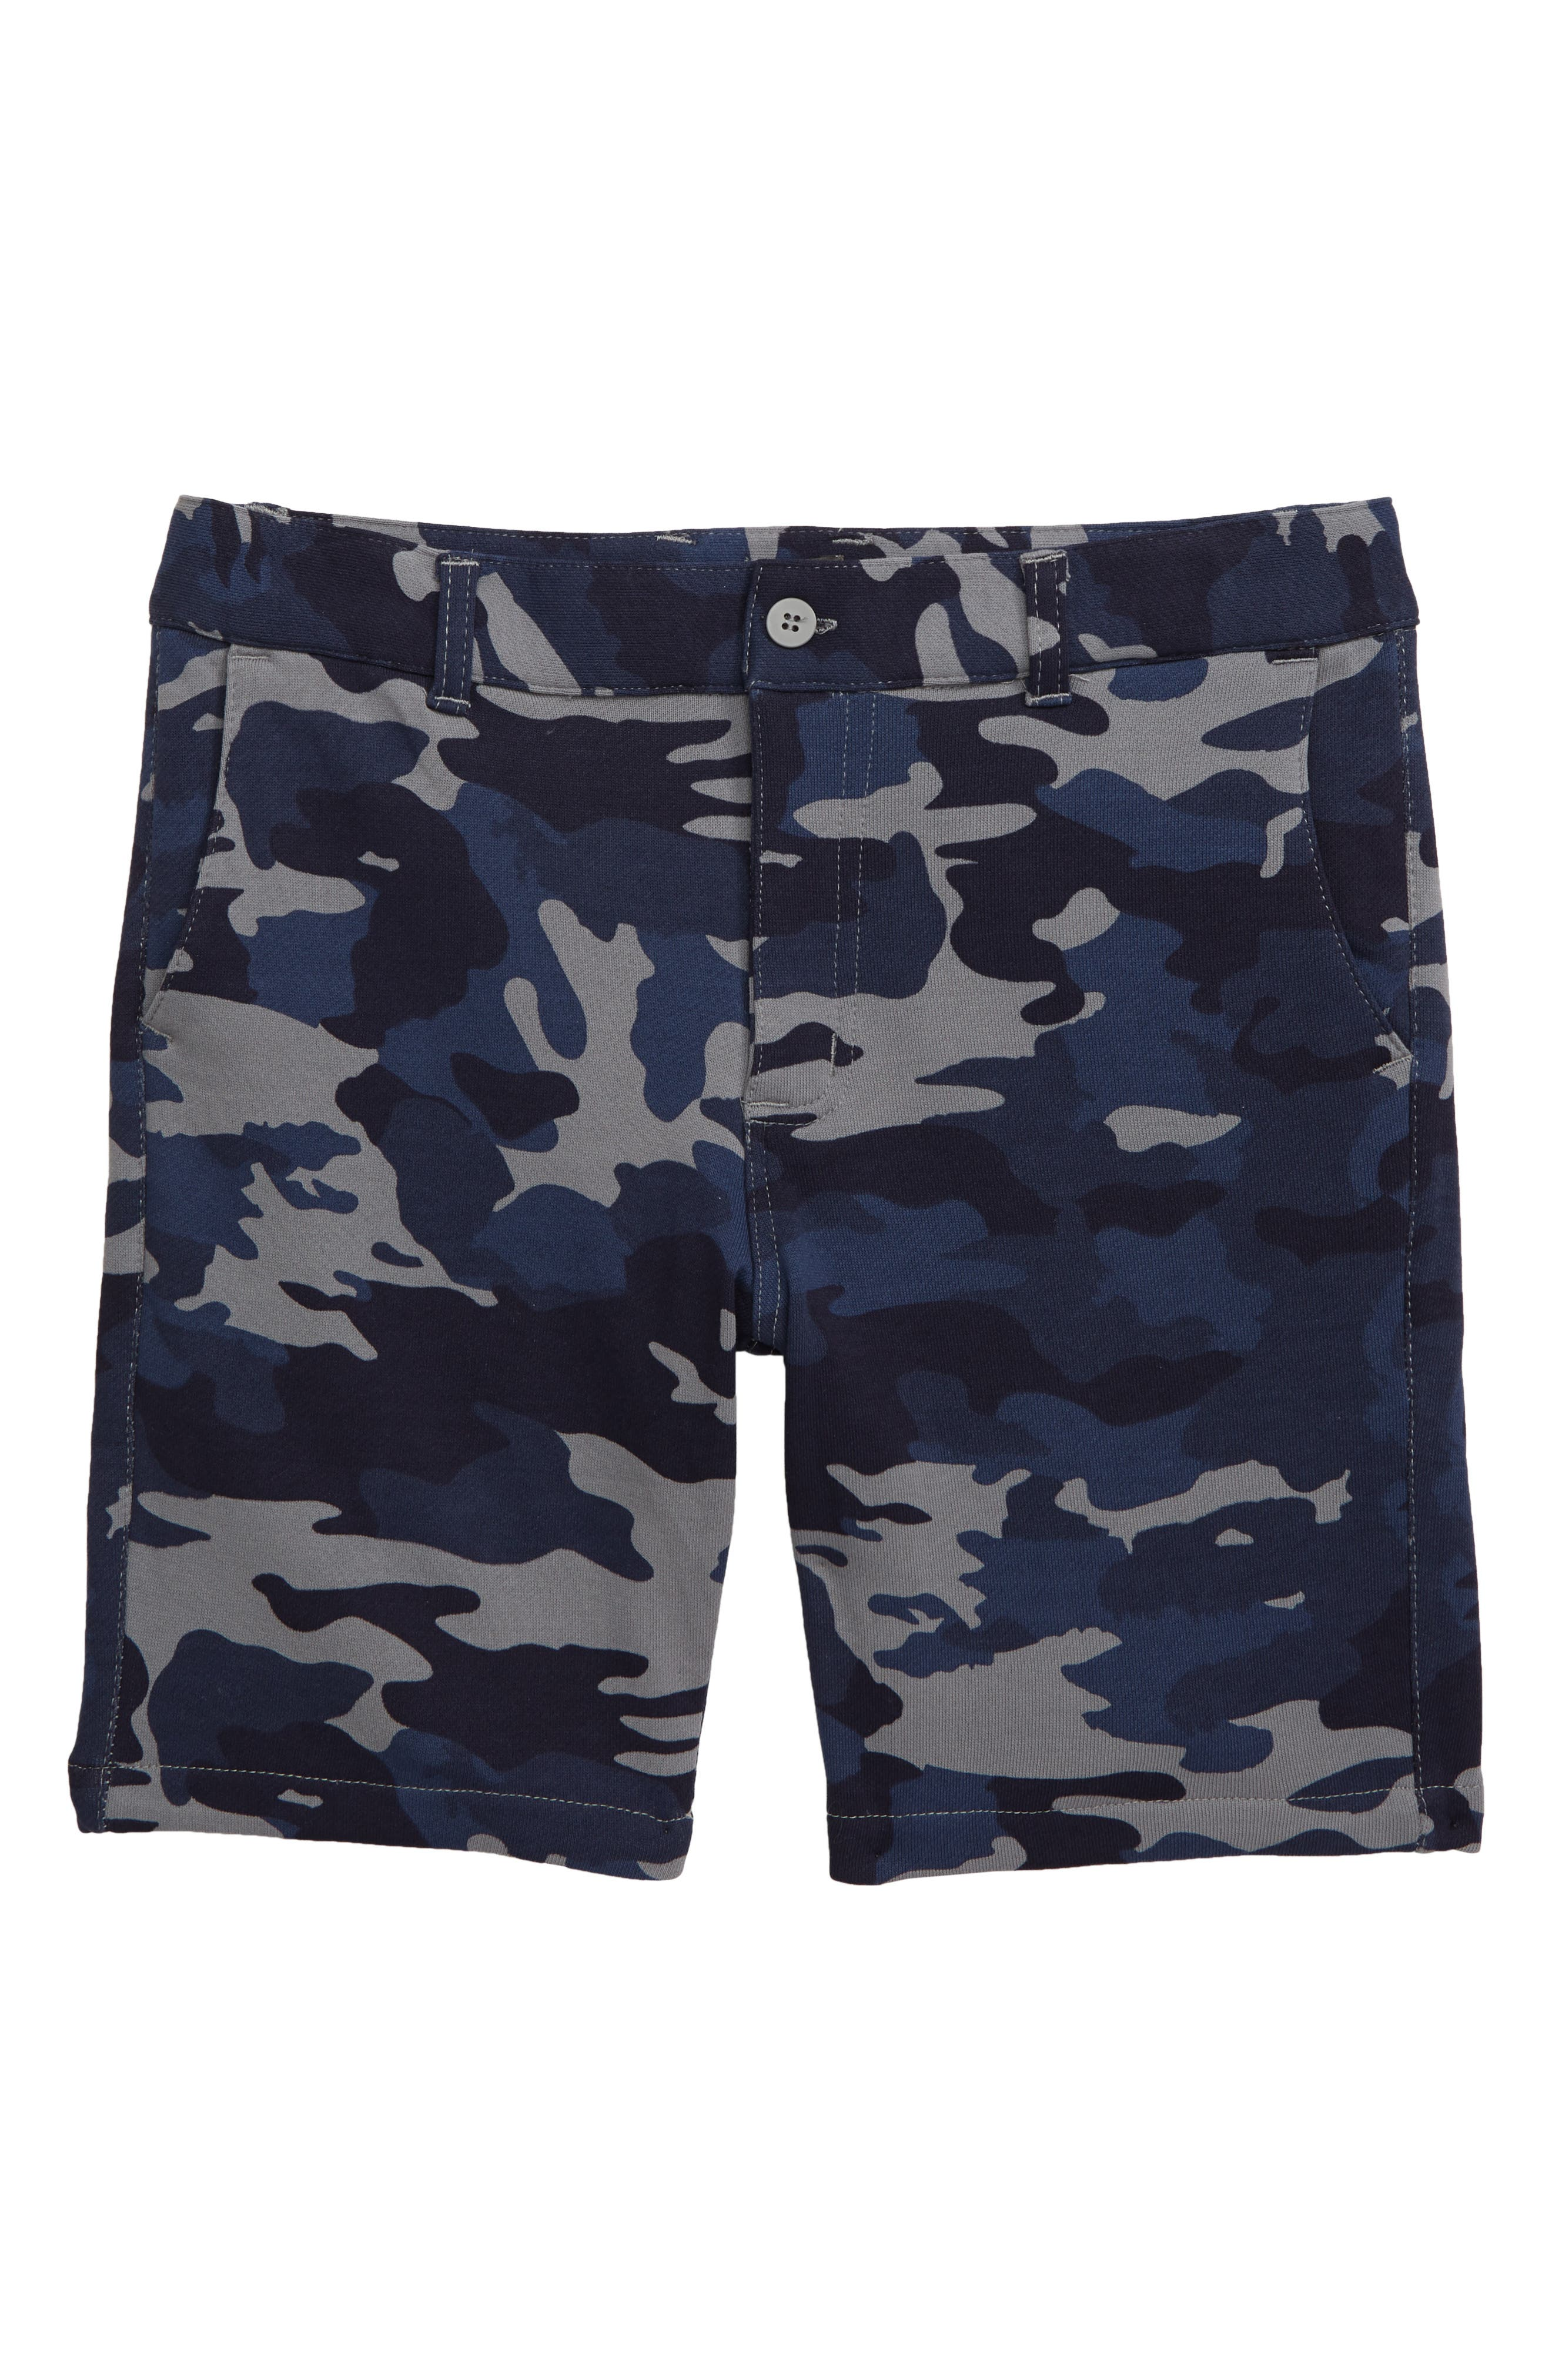 SLATE & STONE Print Shorts, Main, color, BLUE CAMO